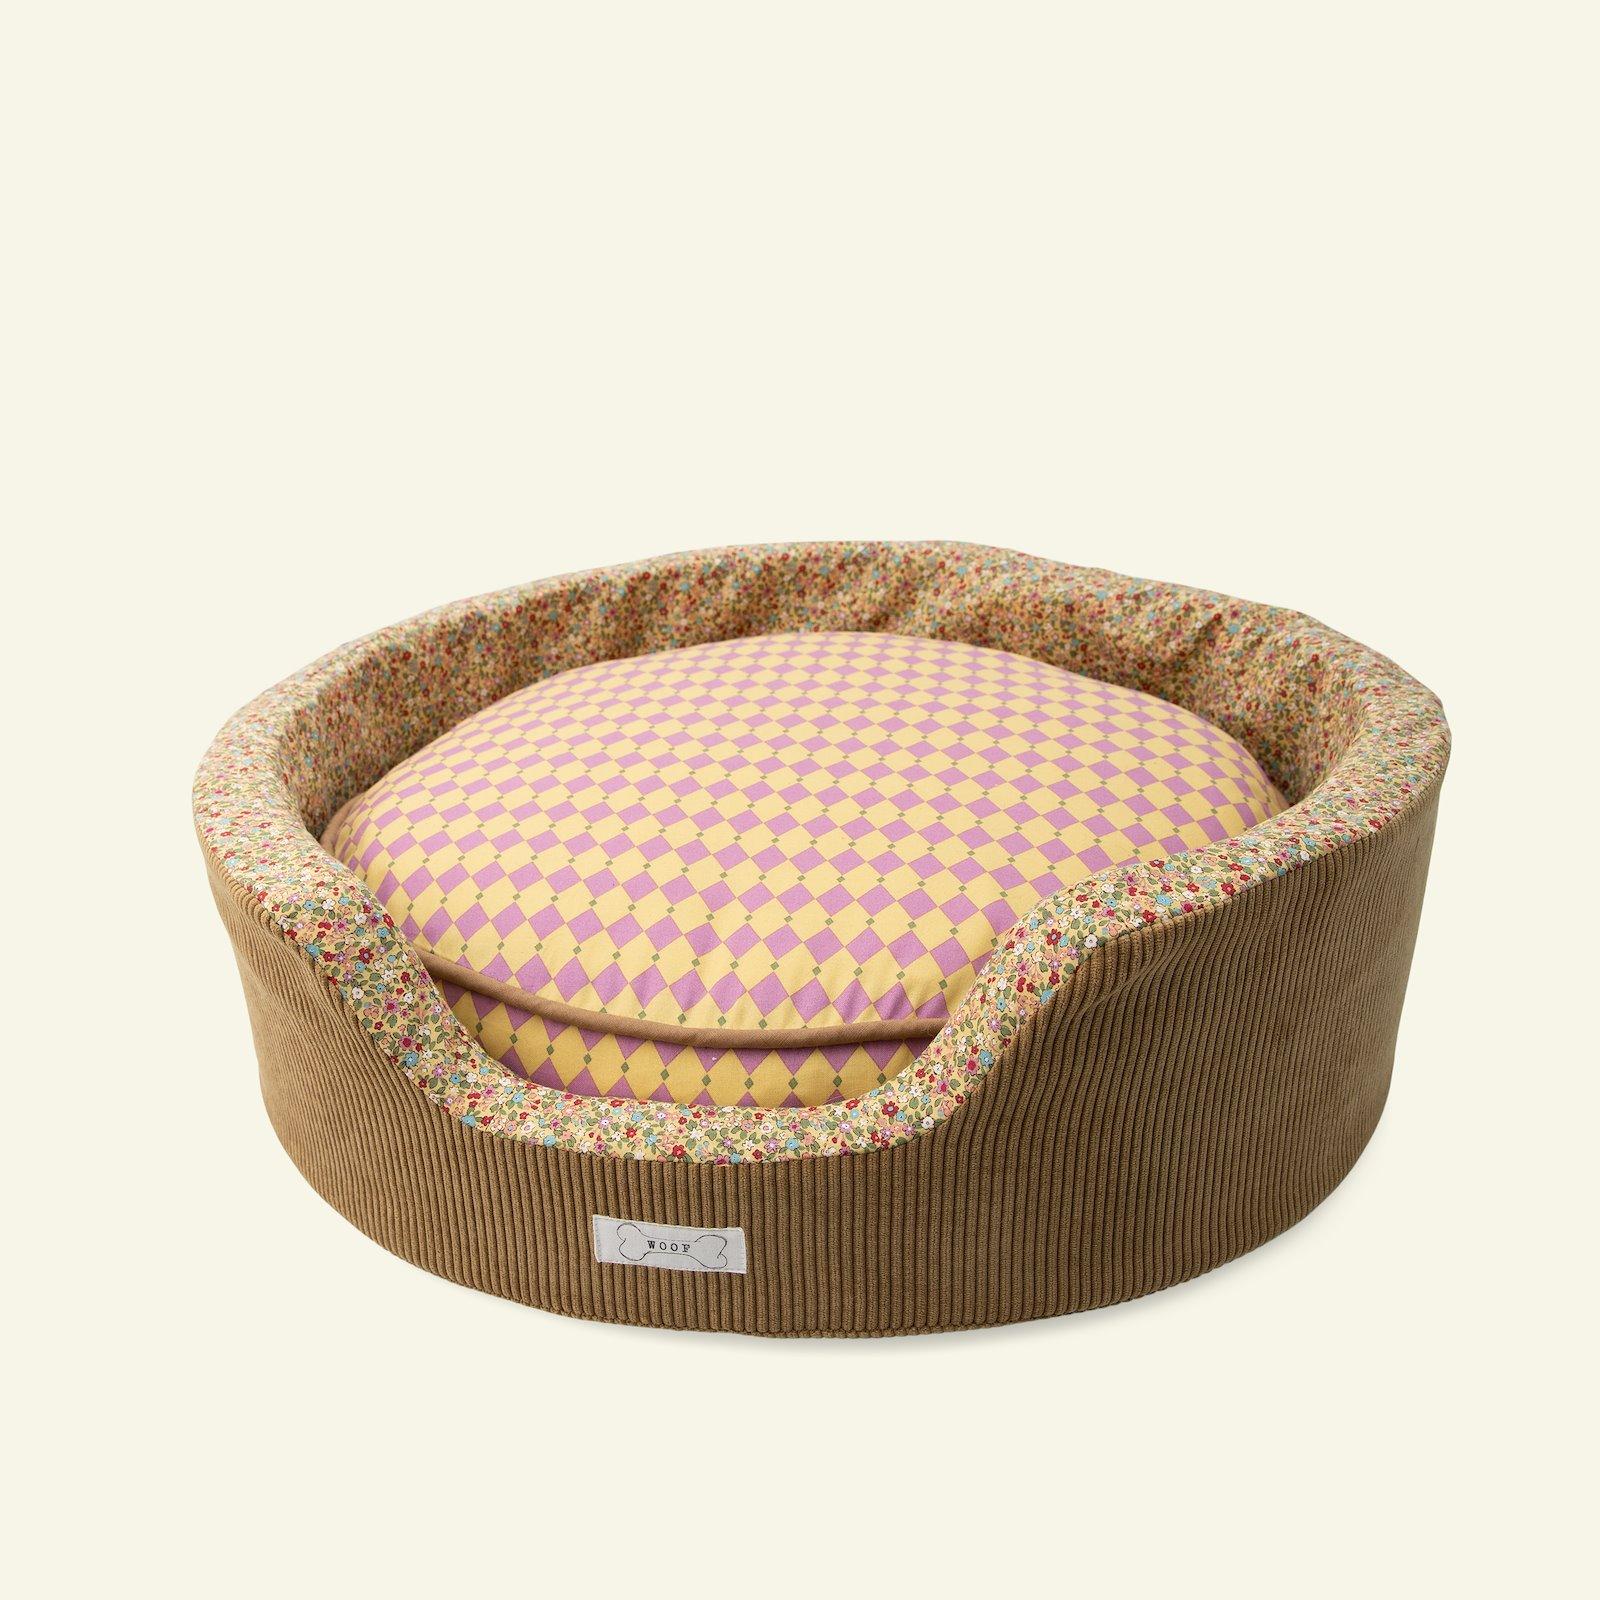 Organic cotton dusty olive p90348_824155_852414_780540_852410_24849_sskit